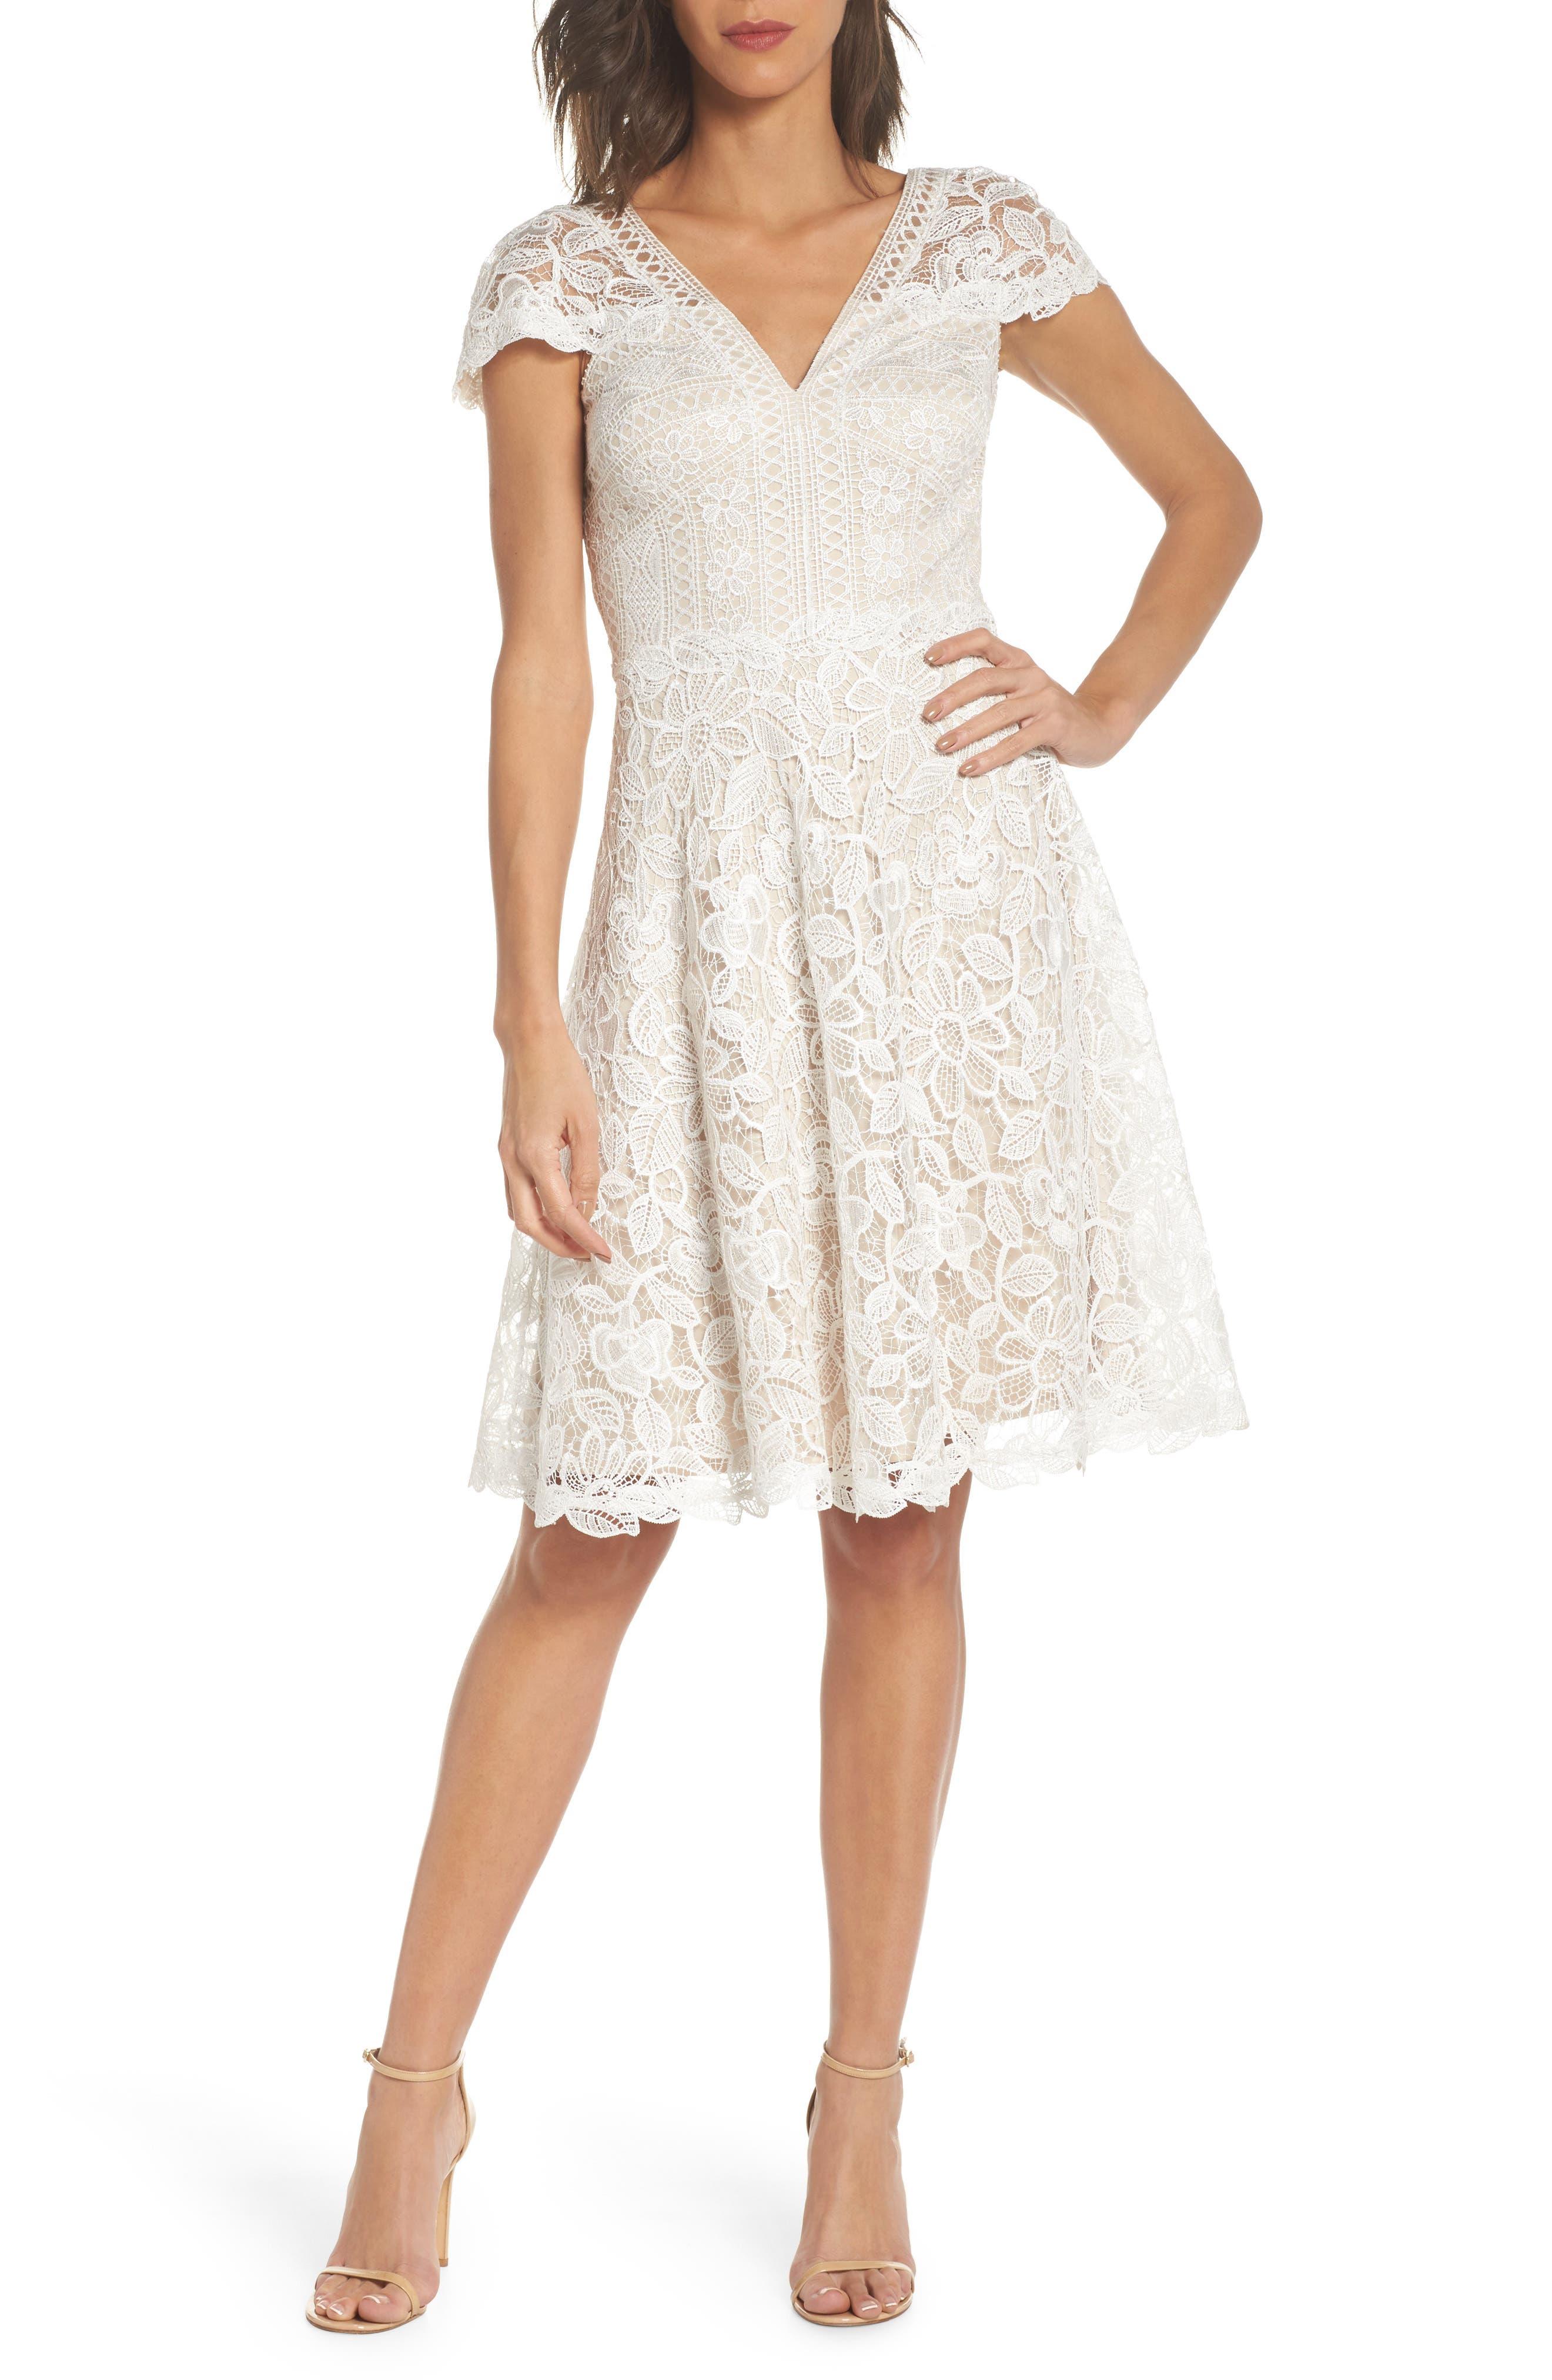 Tadashi Shoji Mixed Lace Fit & Flare Dress